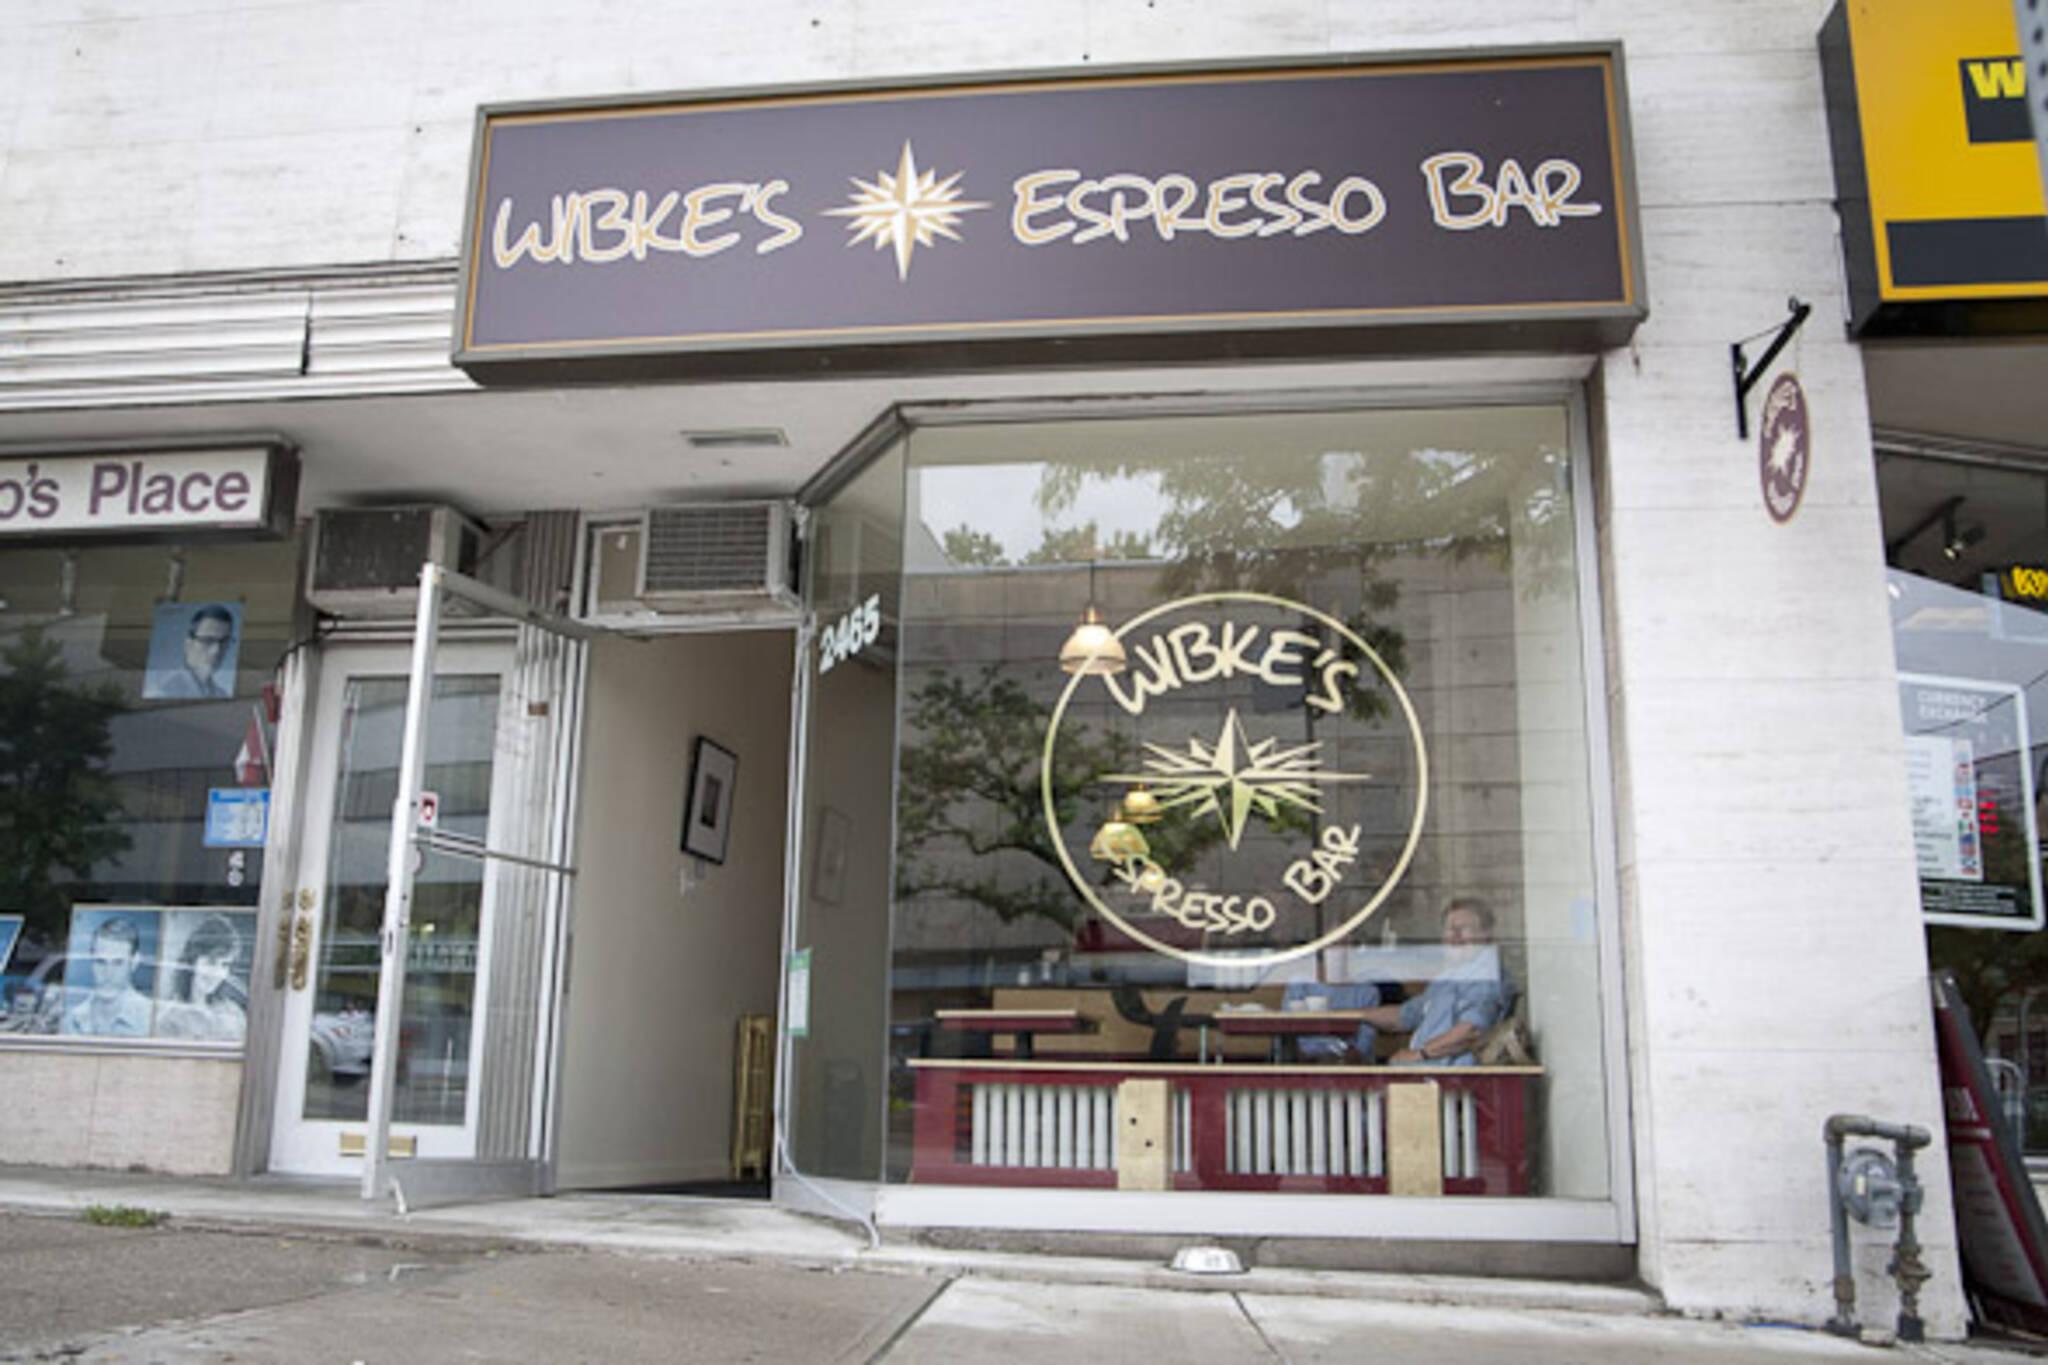 wibkes cafe